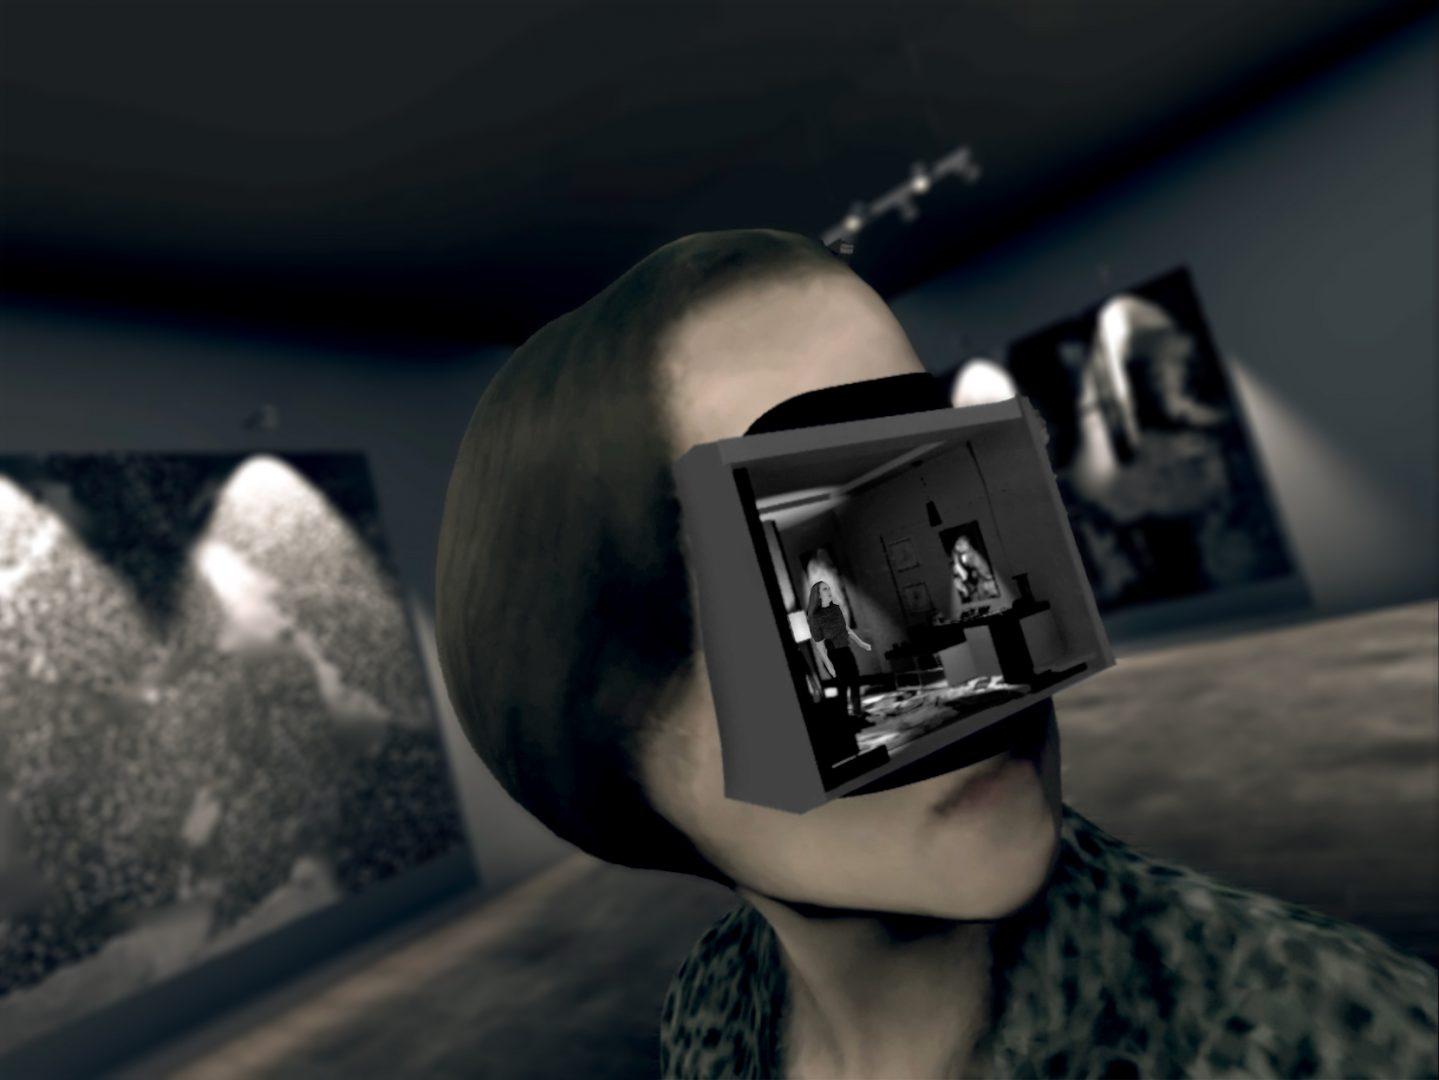 Lauren Moffatt, Beyond the Rubicon Image, Technology Echoes